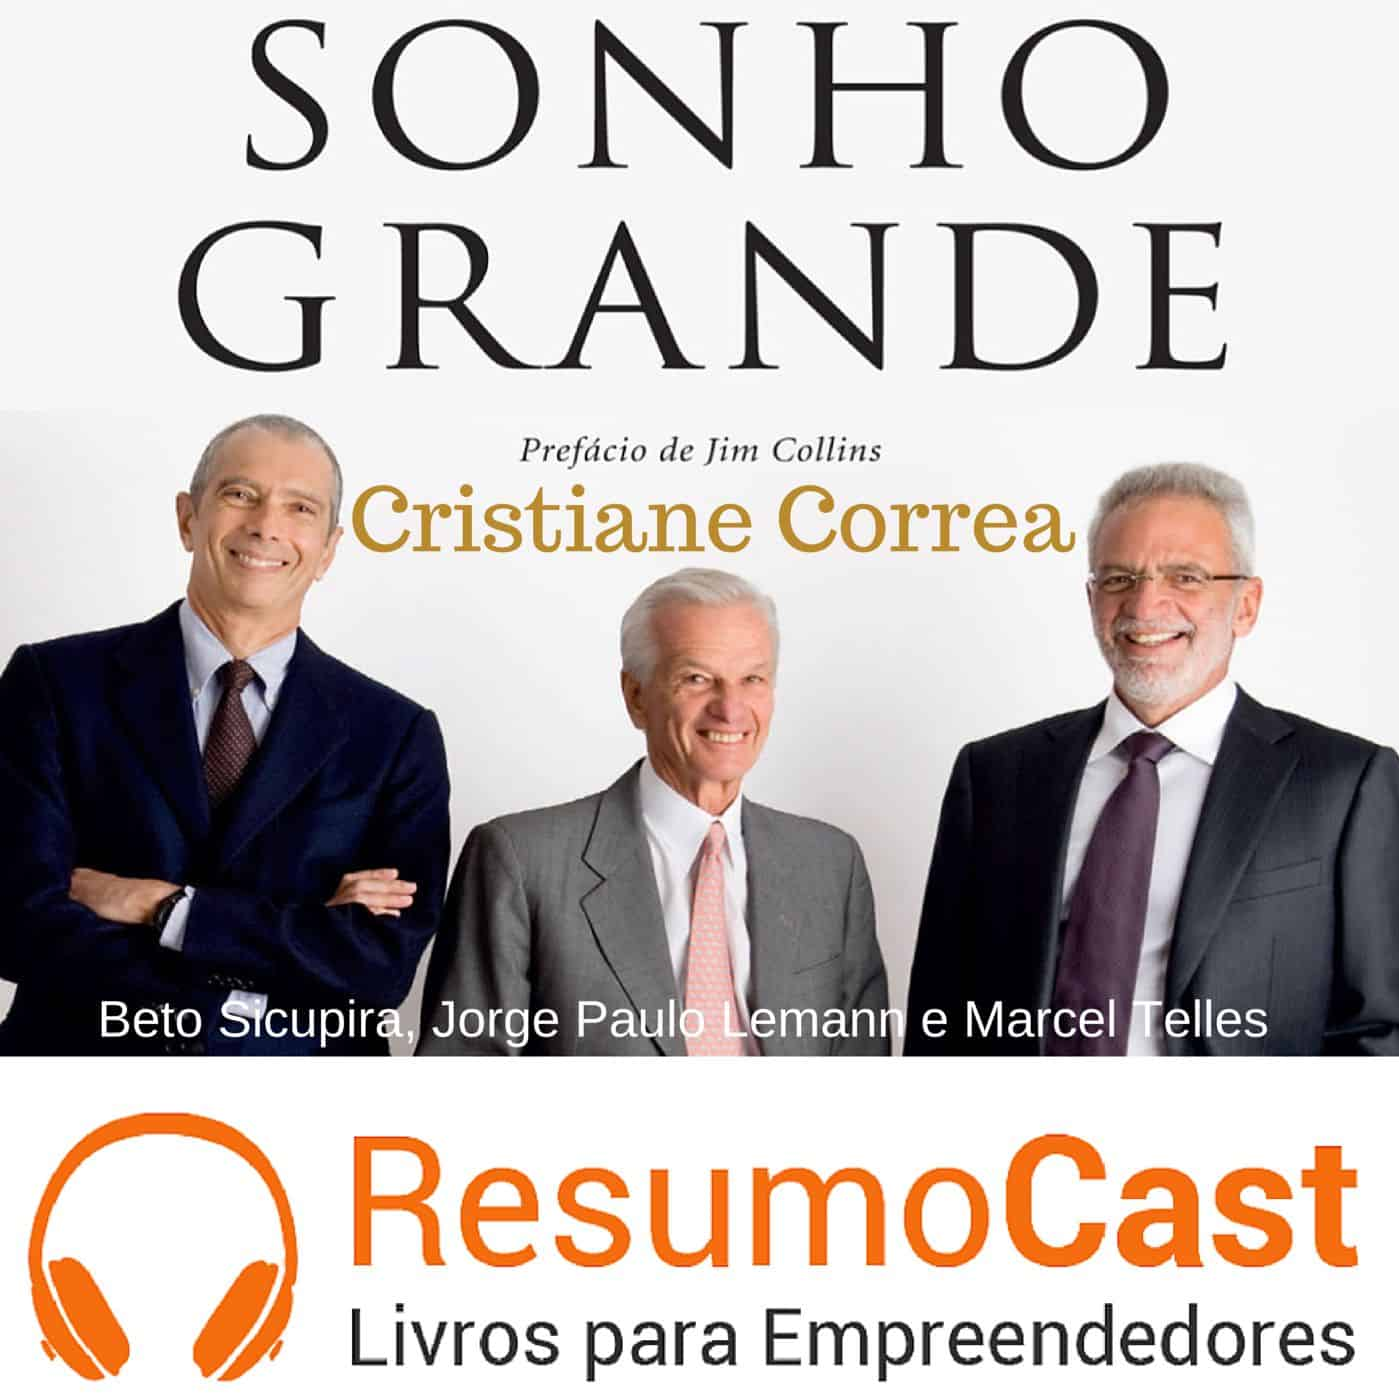 Sonho Grande – Cristiane Correa | T1#021